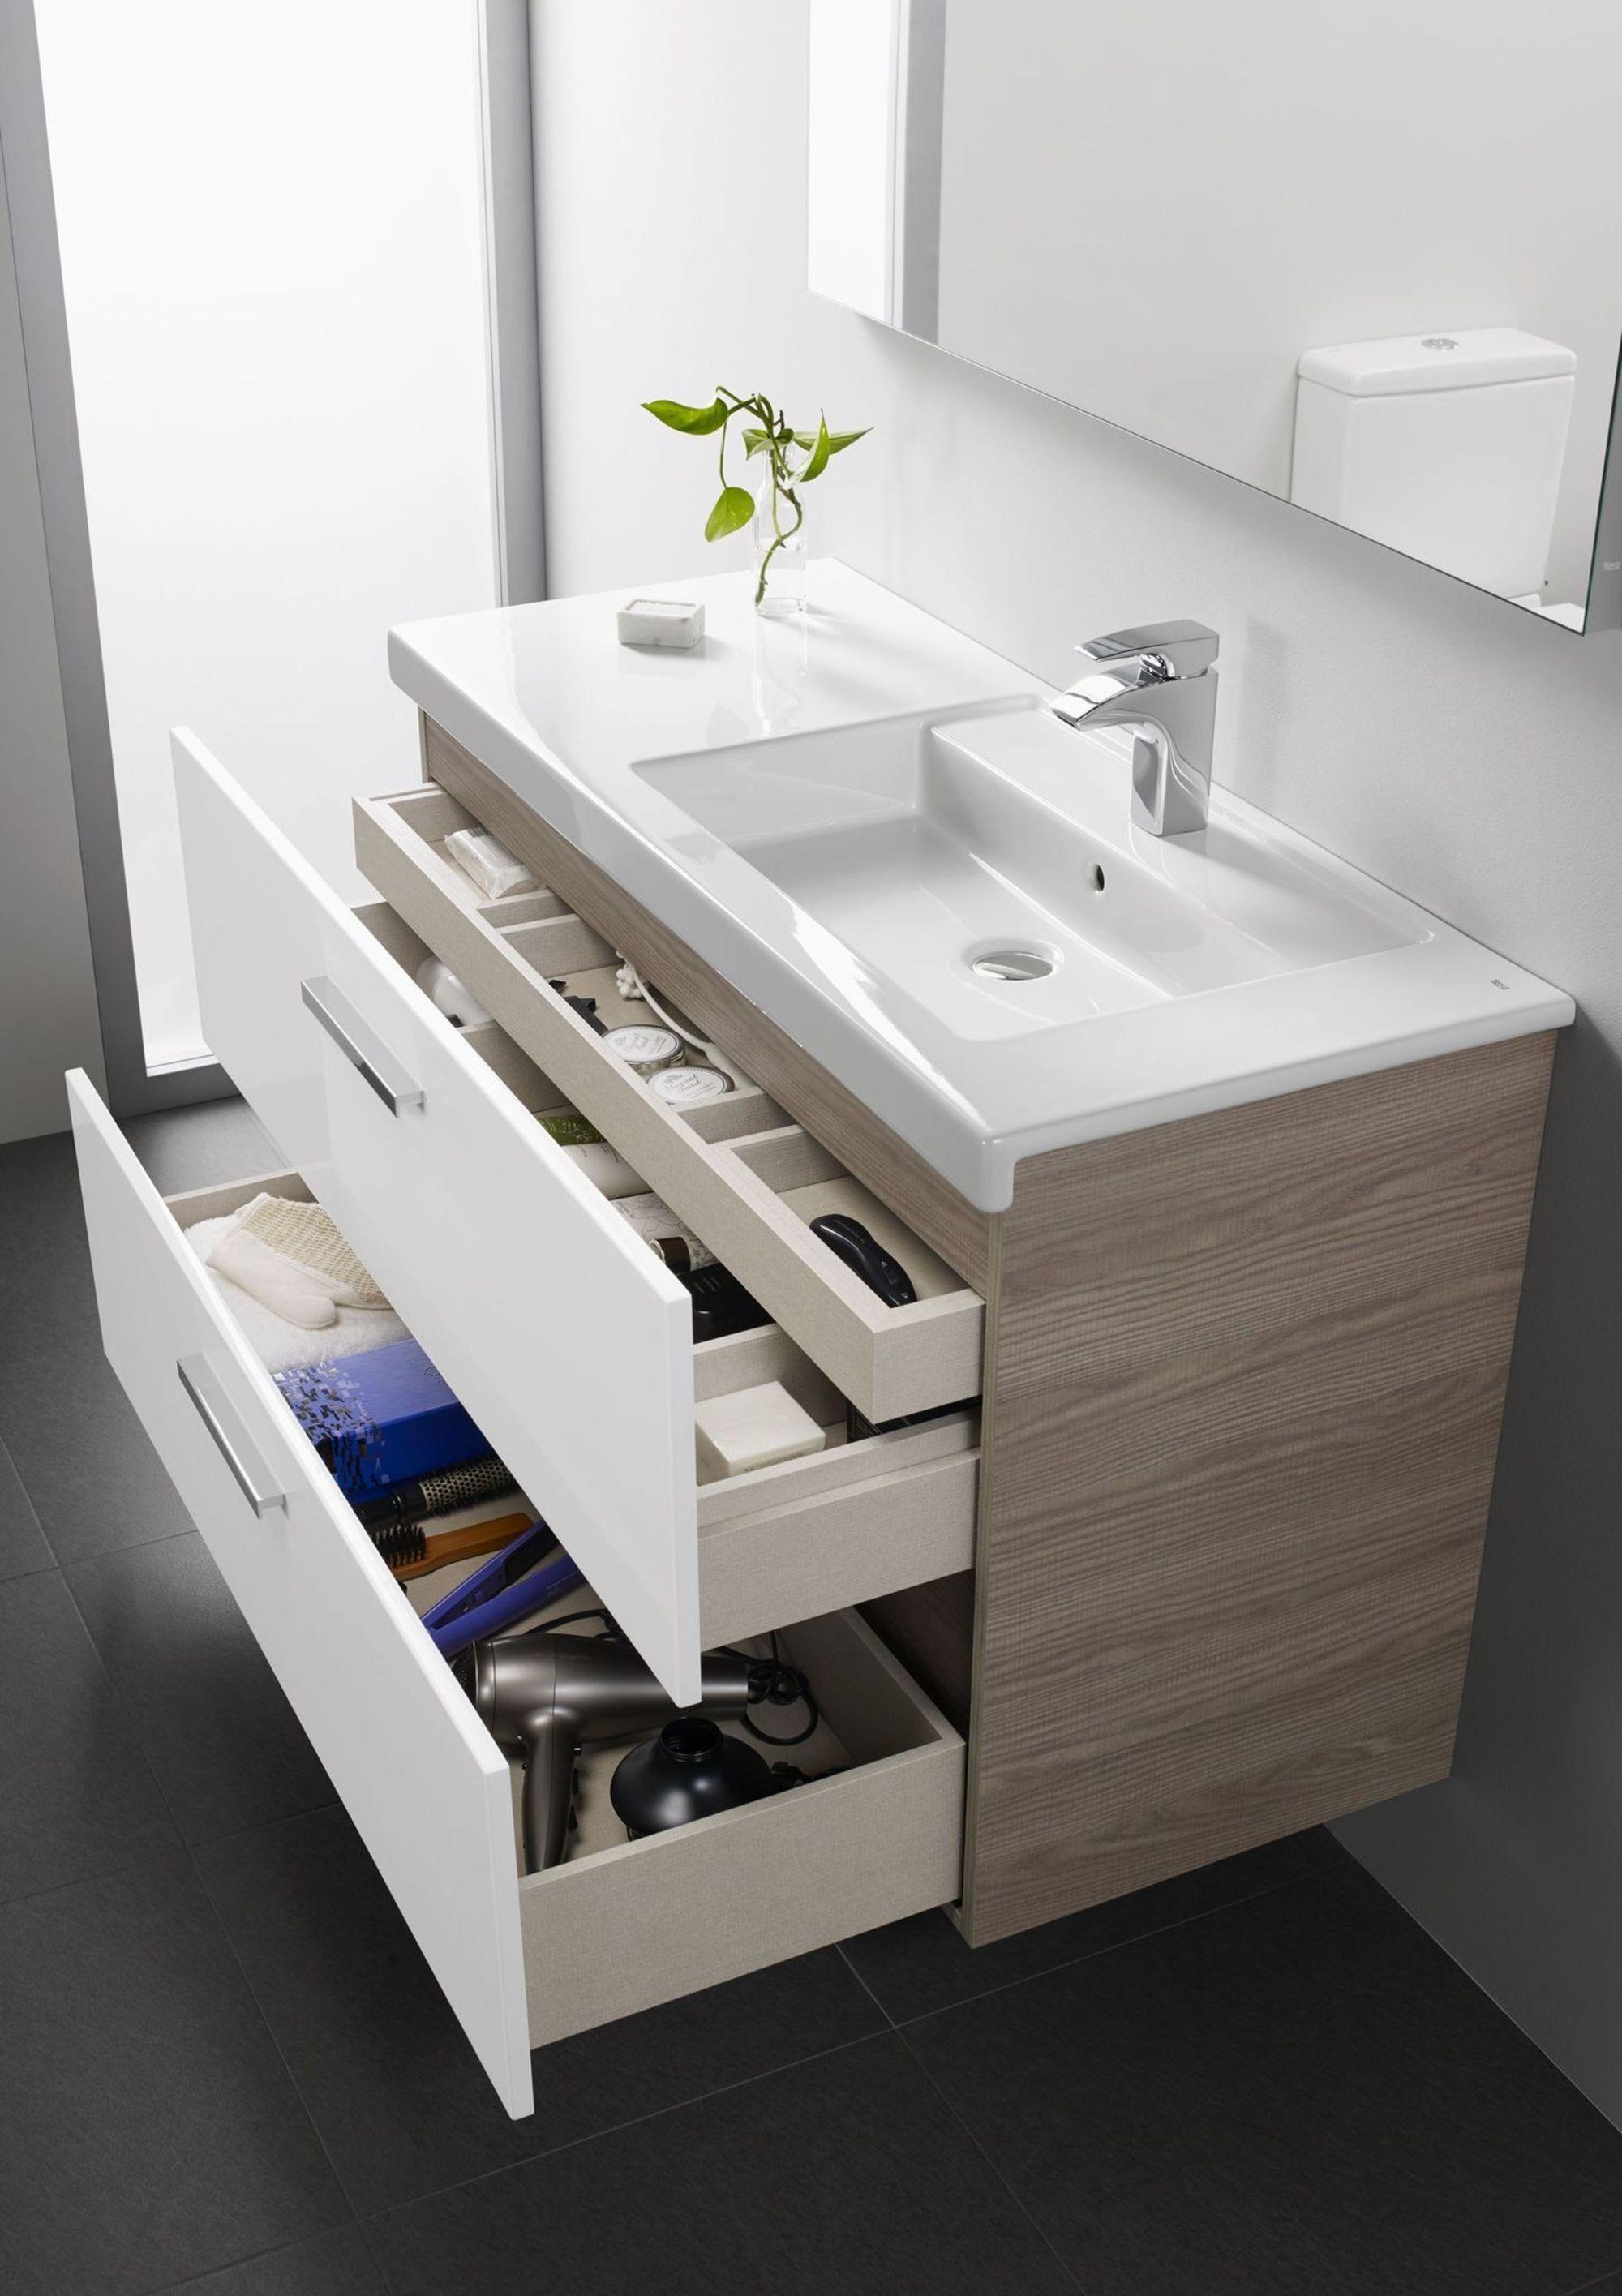 Trend Ikea Salle De Bains Meuble Vasques